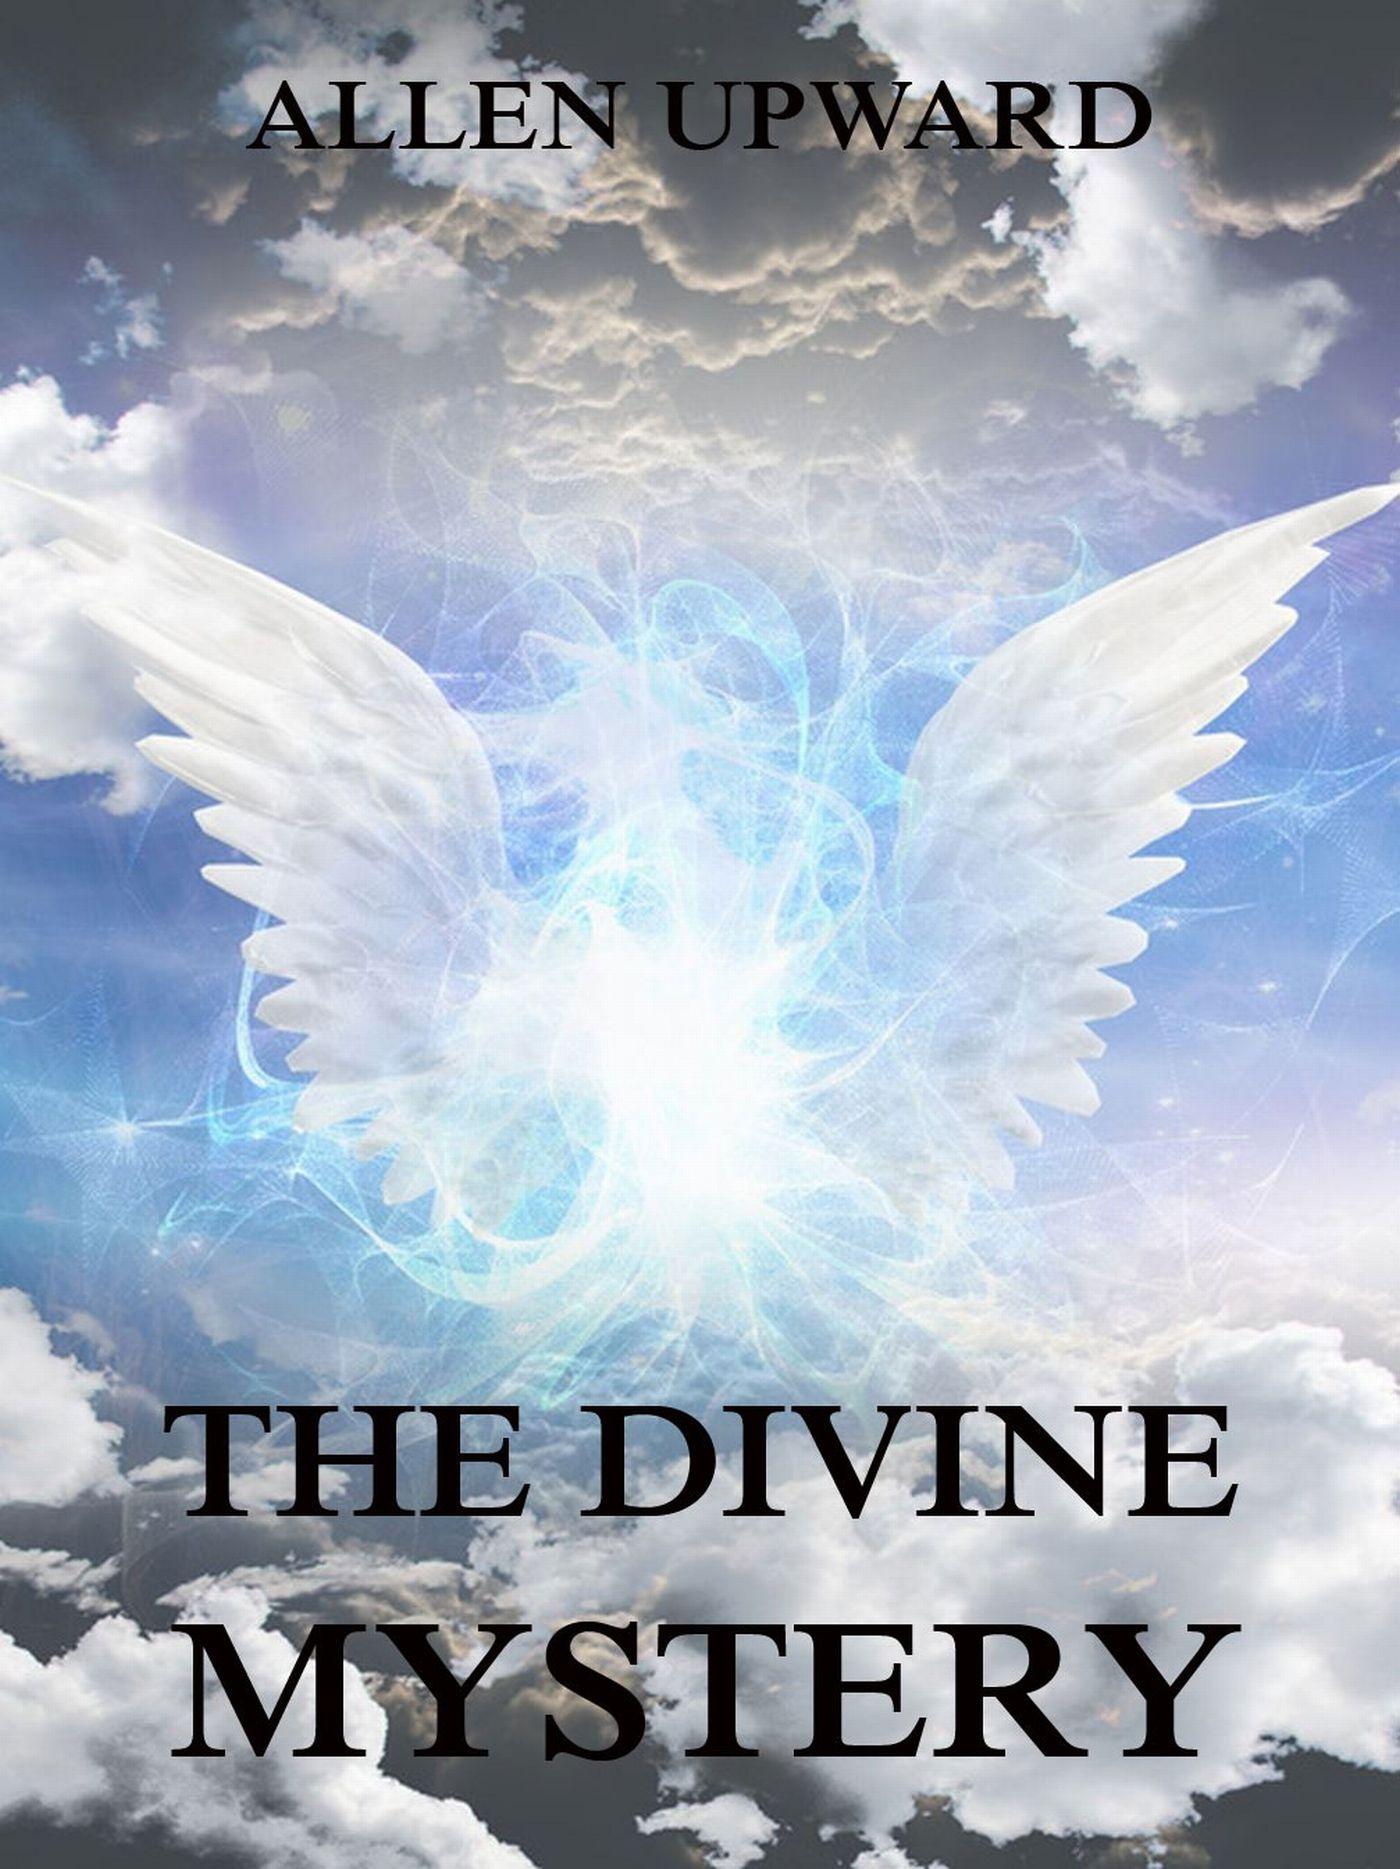 лучшая цена Allen Upward The Divine Mystery